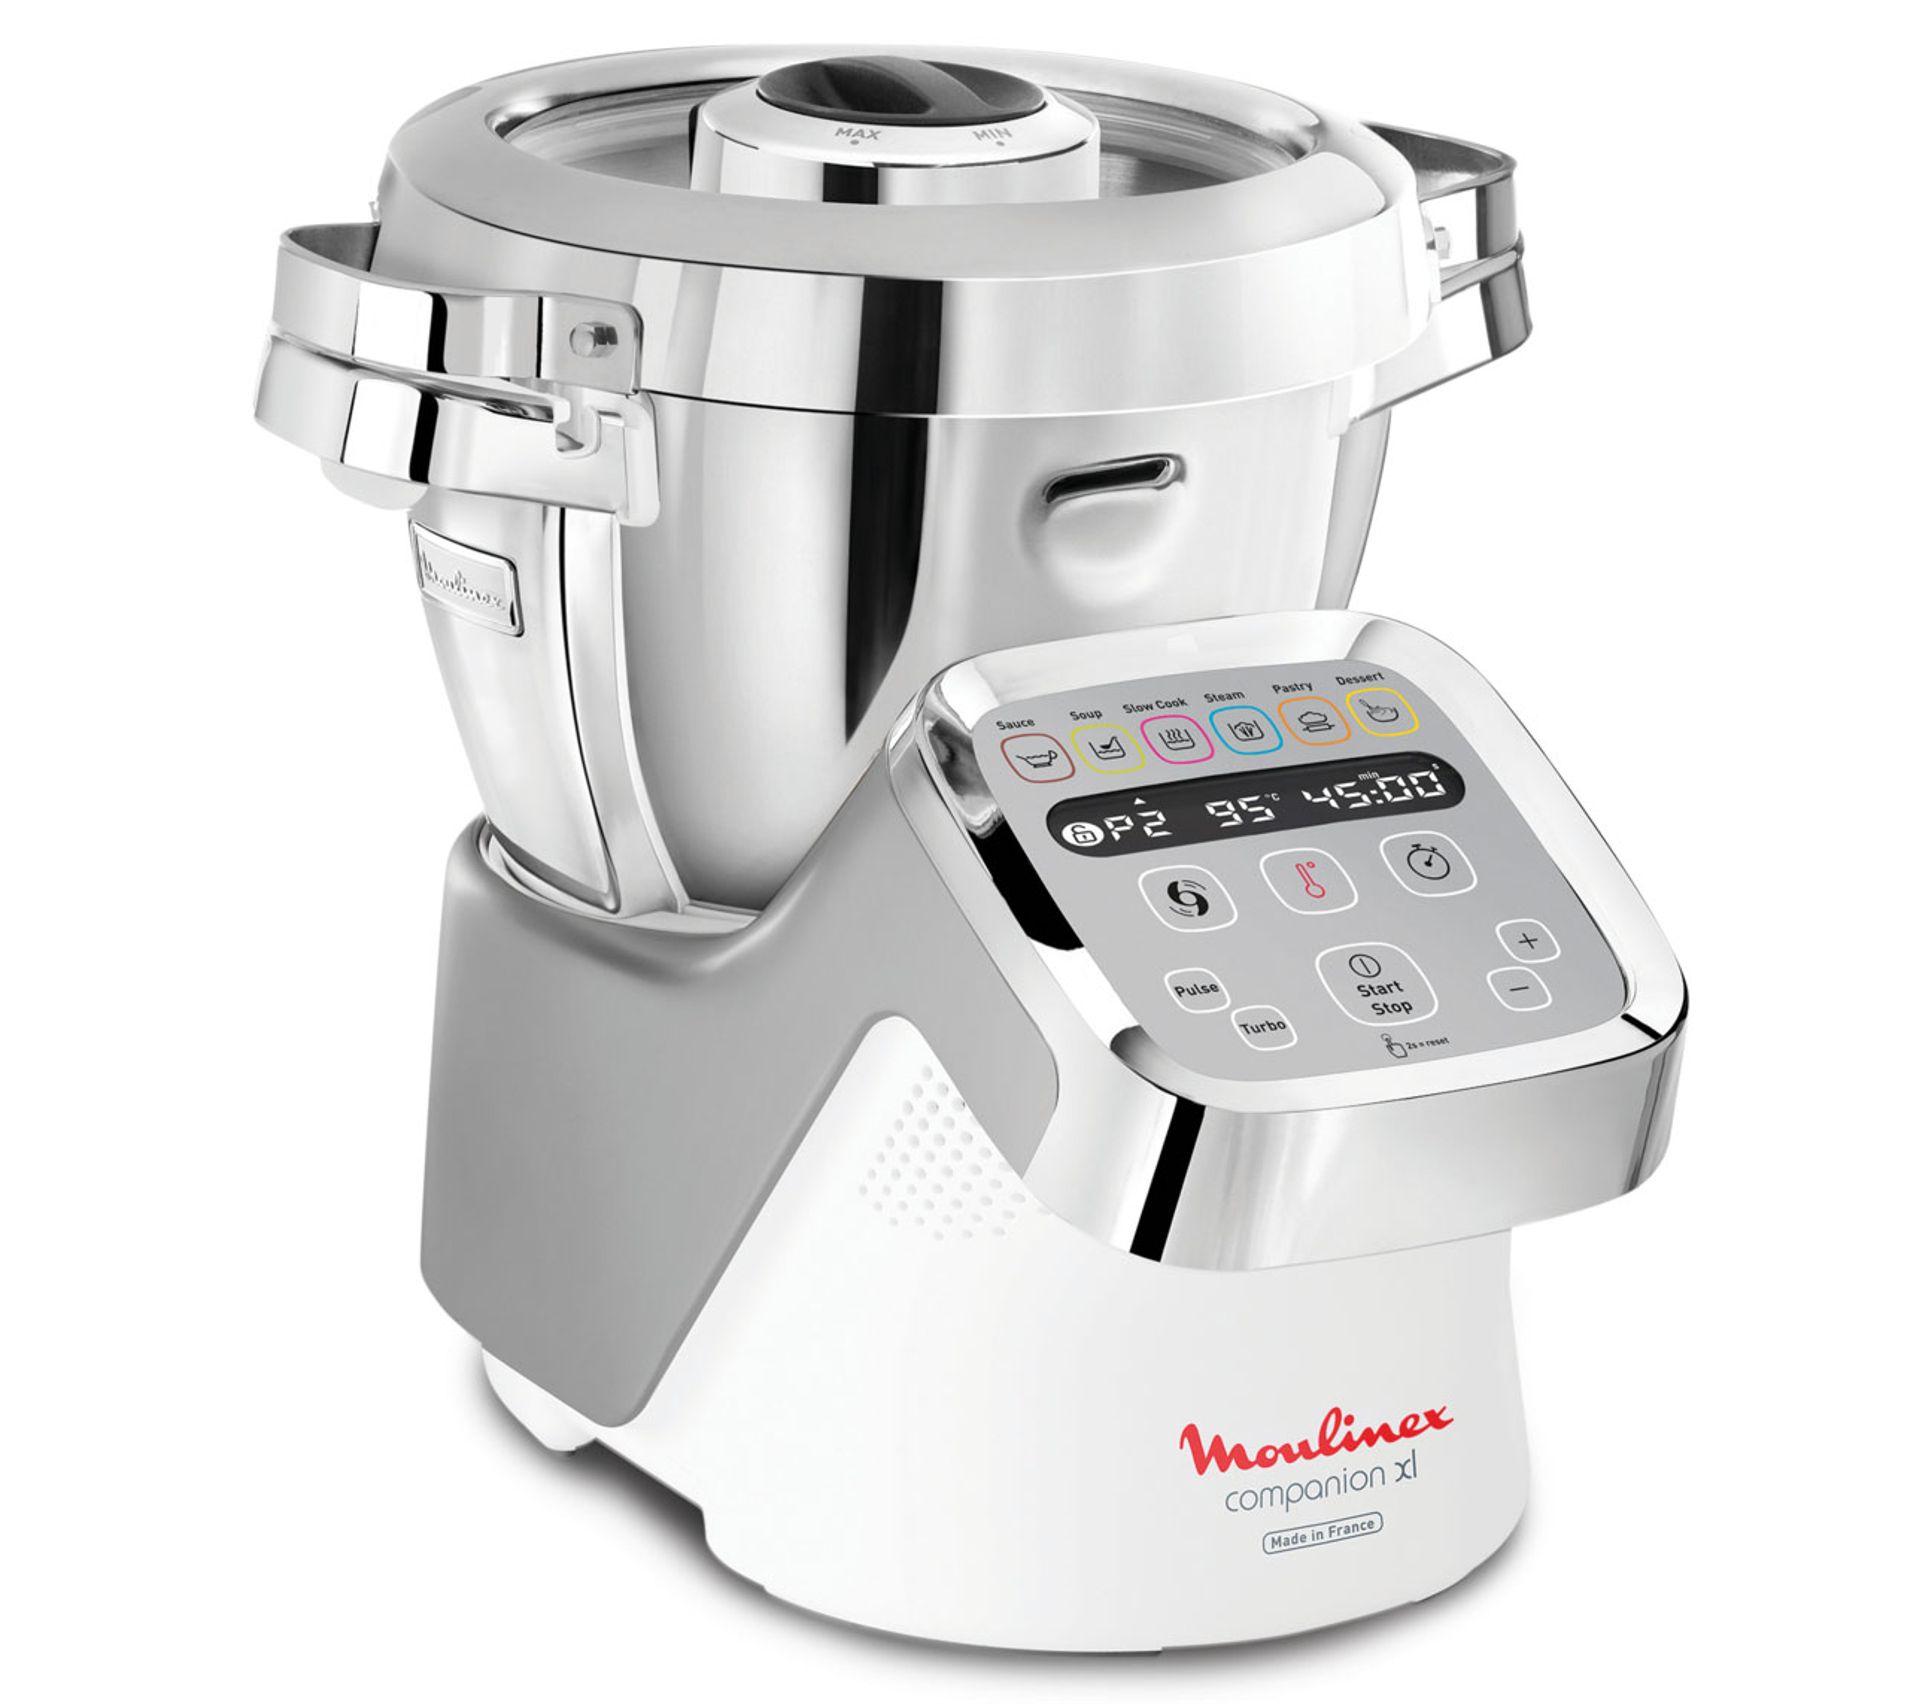 Bon Coin Robot Patissier robot cuiseur - companion xl yy3979fg